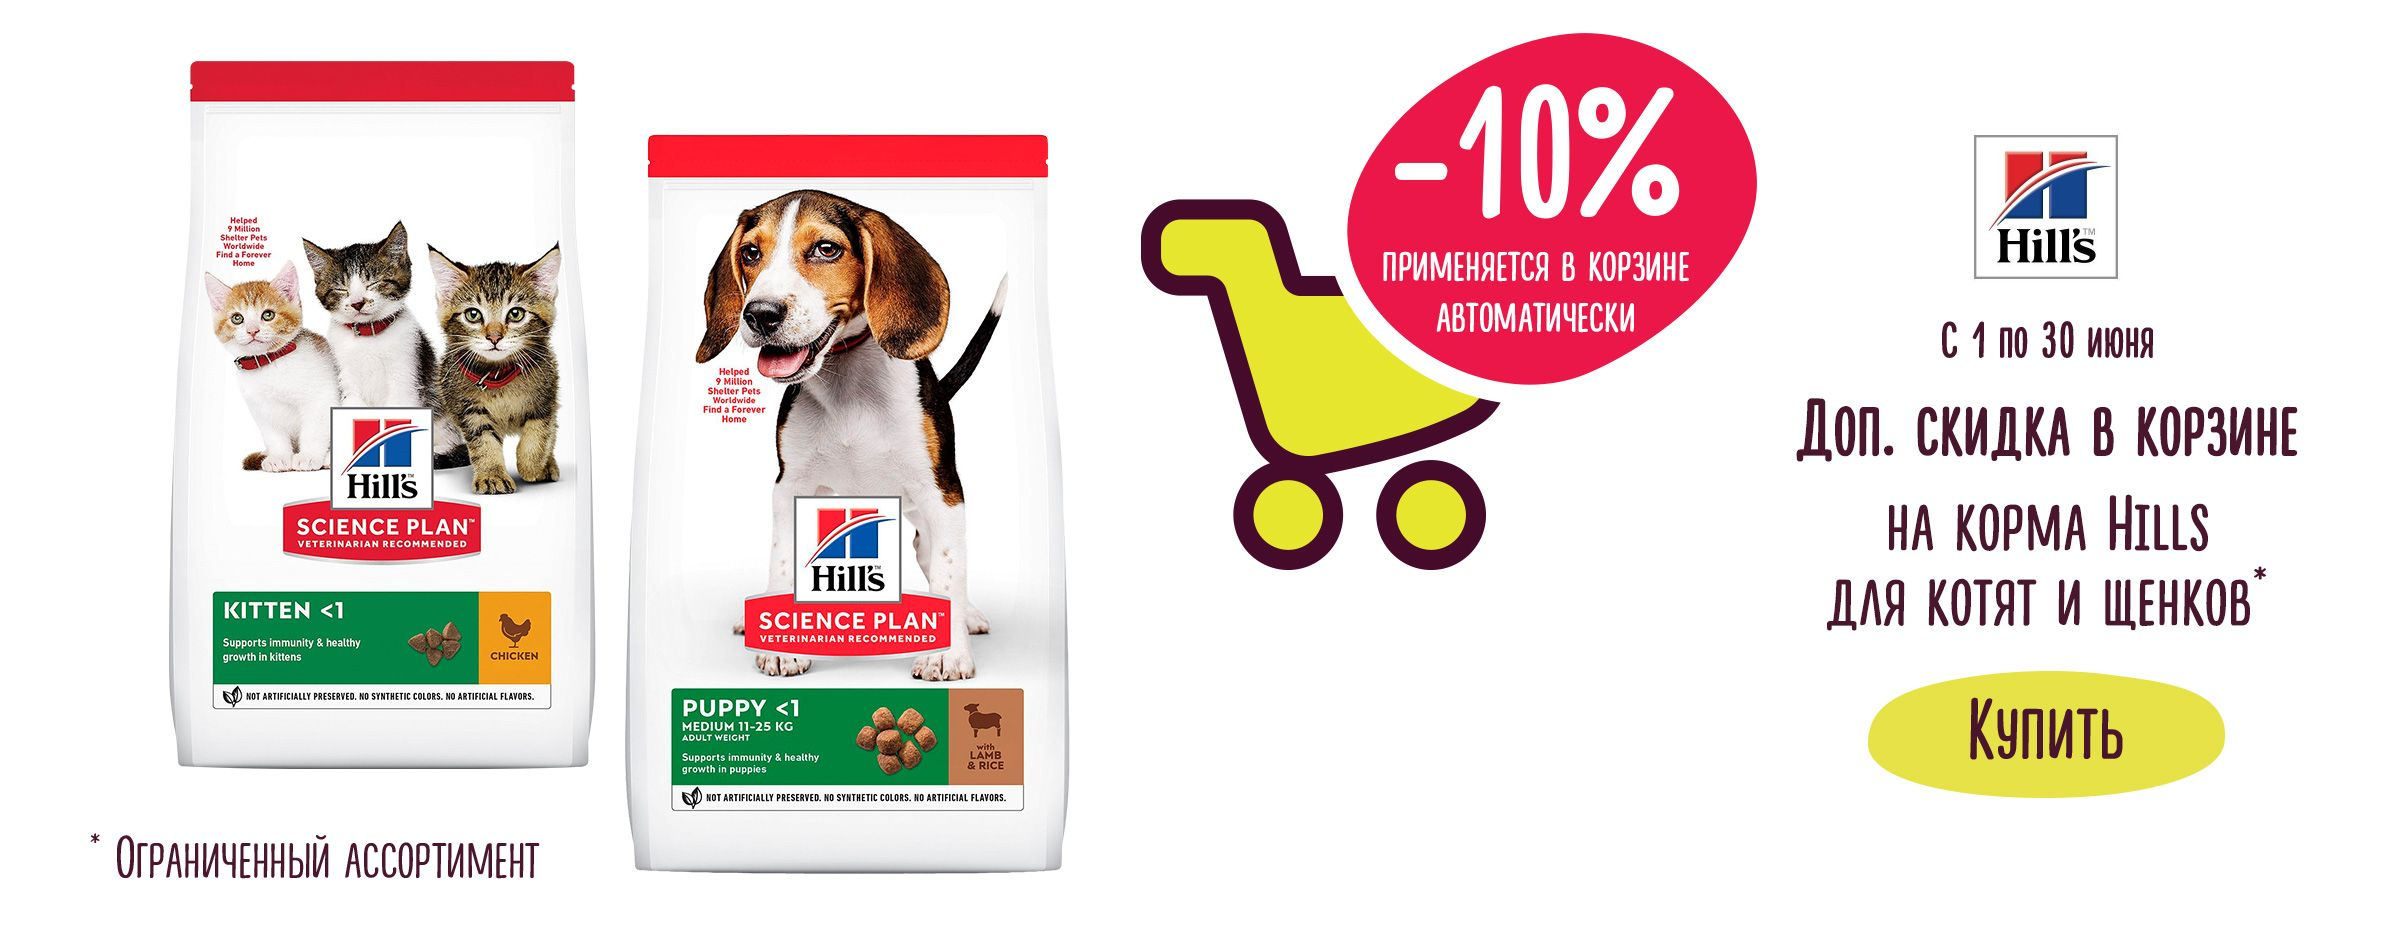 Доп. скидка 10% на корма Hills для котят и щенков